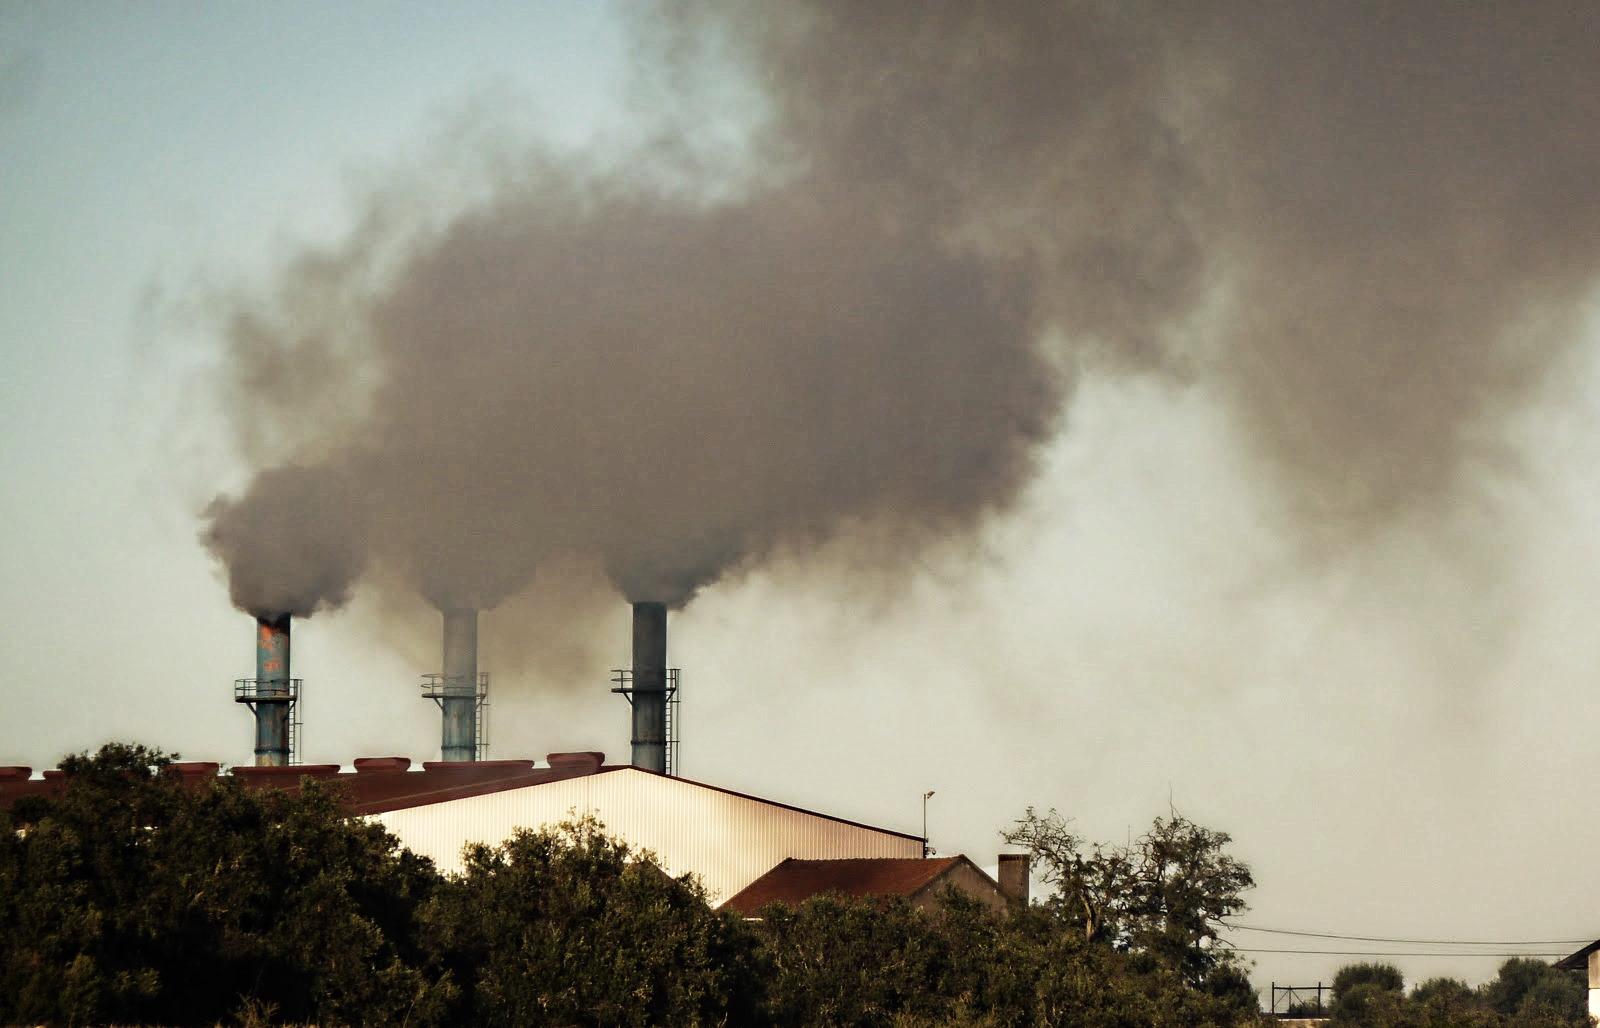 Trancoso: Fábrica de Processamento de Bagaço de Azeitona chega ao Parlamento